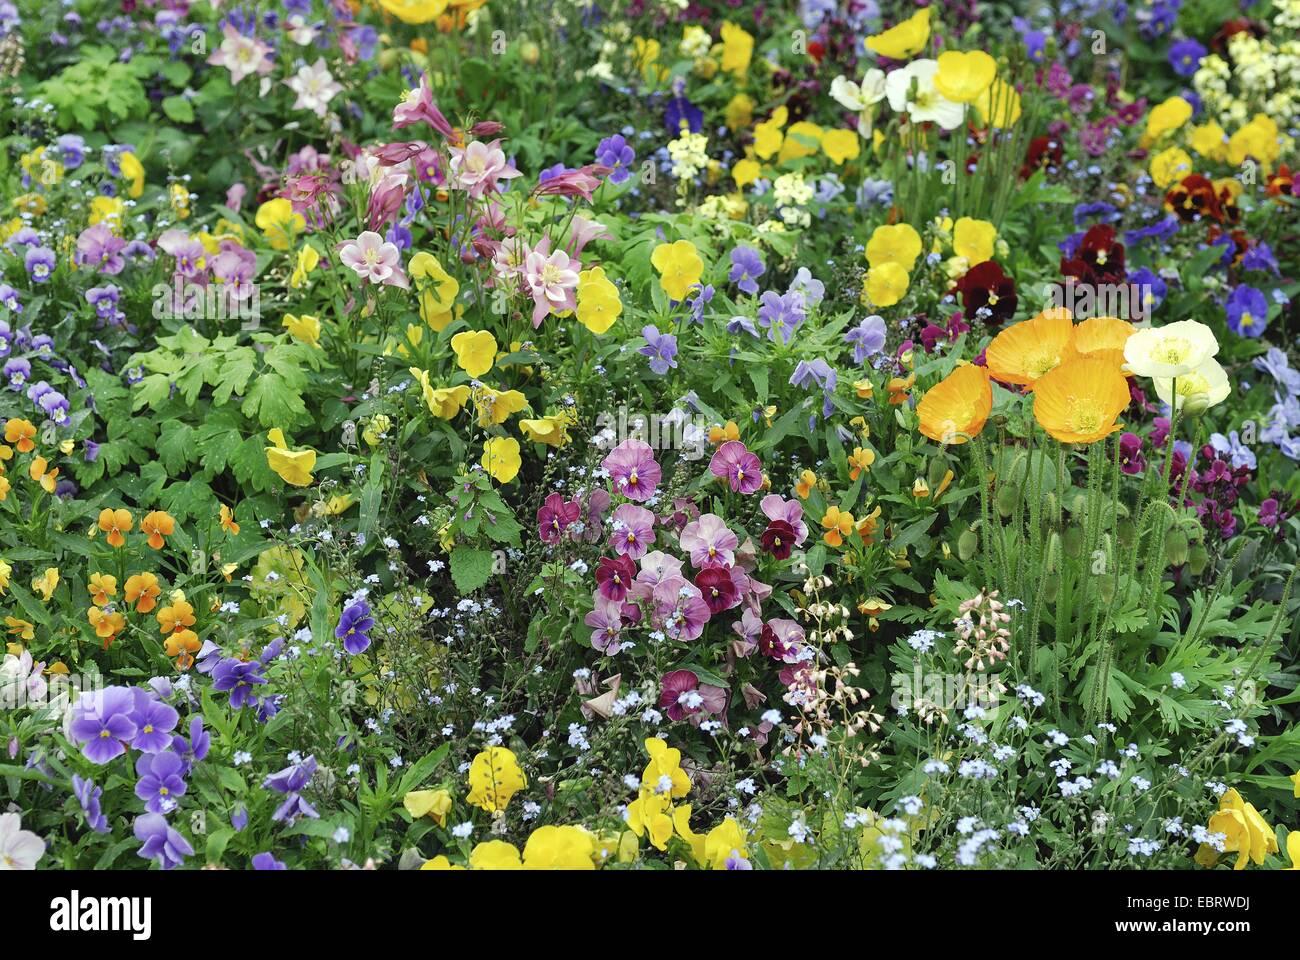 Pansy, Pansy Violet (Viola x wittrockiana, Viola wittrockiana, Viola hybrida), flowerbed in spring - Stock Image